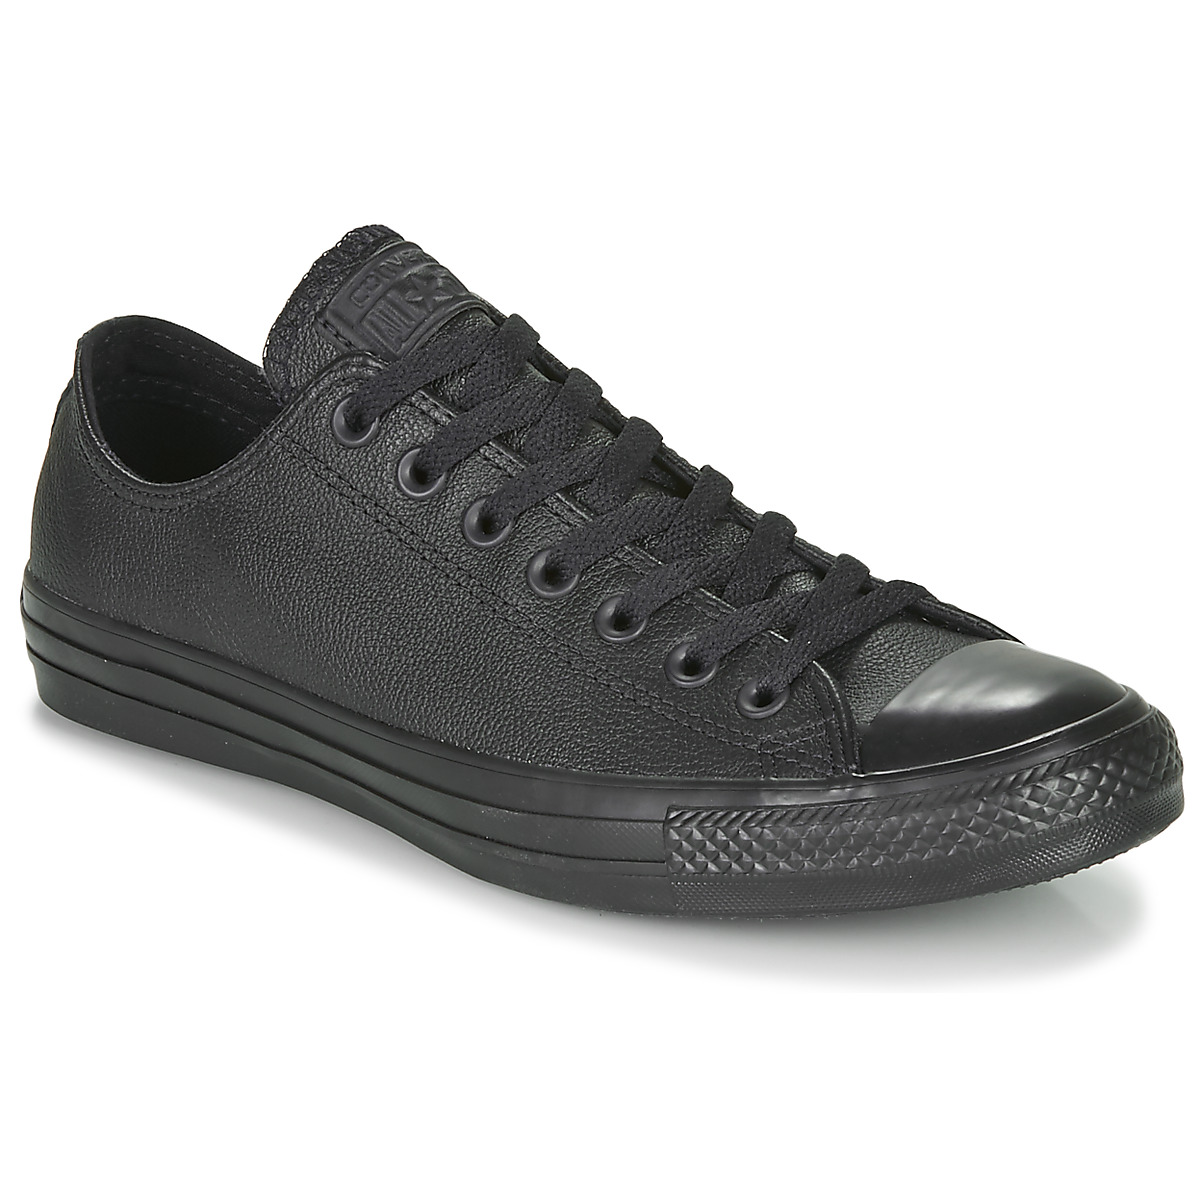 Converse CHUCK TAYLOR ALL STAR MONO OX Schwarz - Kostenloser Versand bei Spartoode ! - Schuhe Sneaker Low  67,99 €